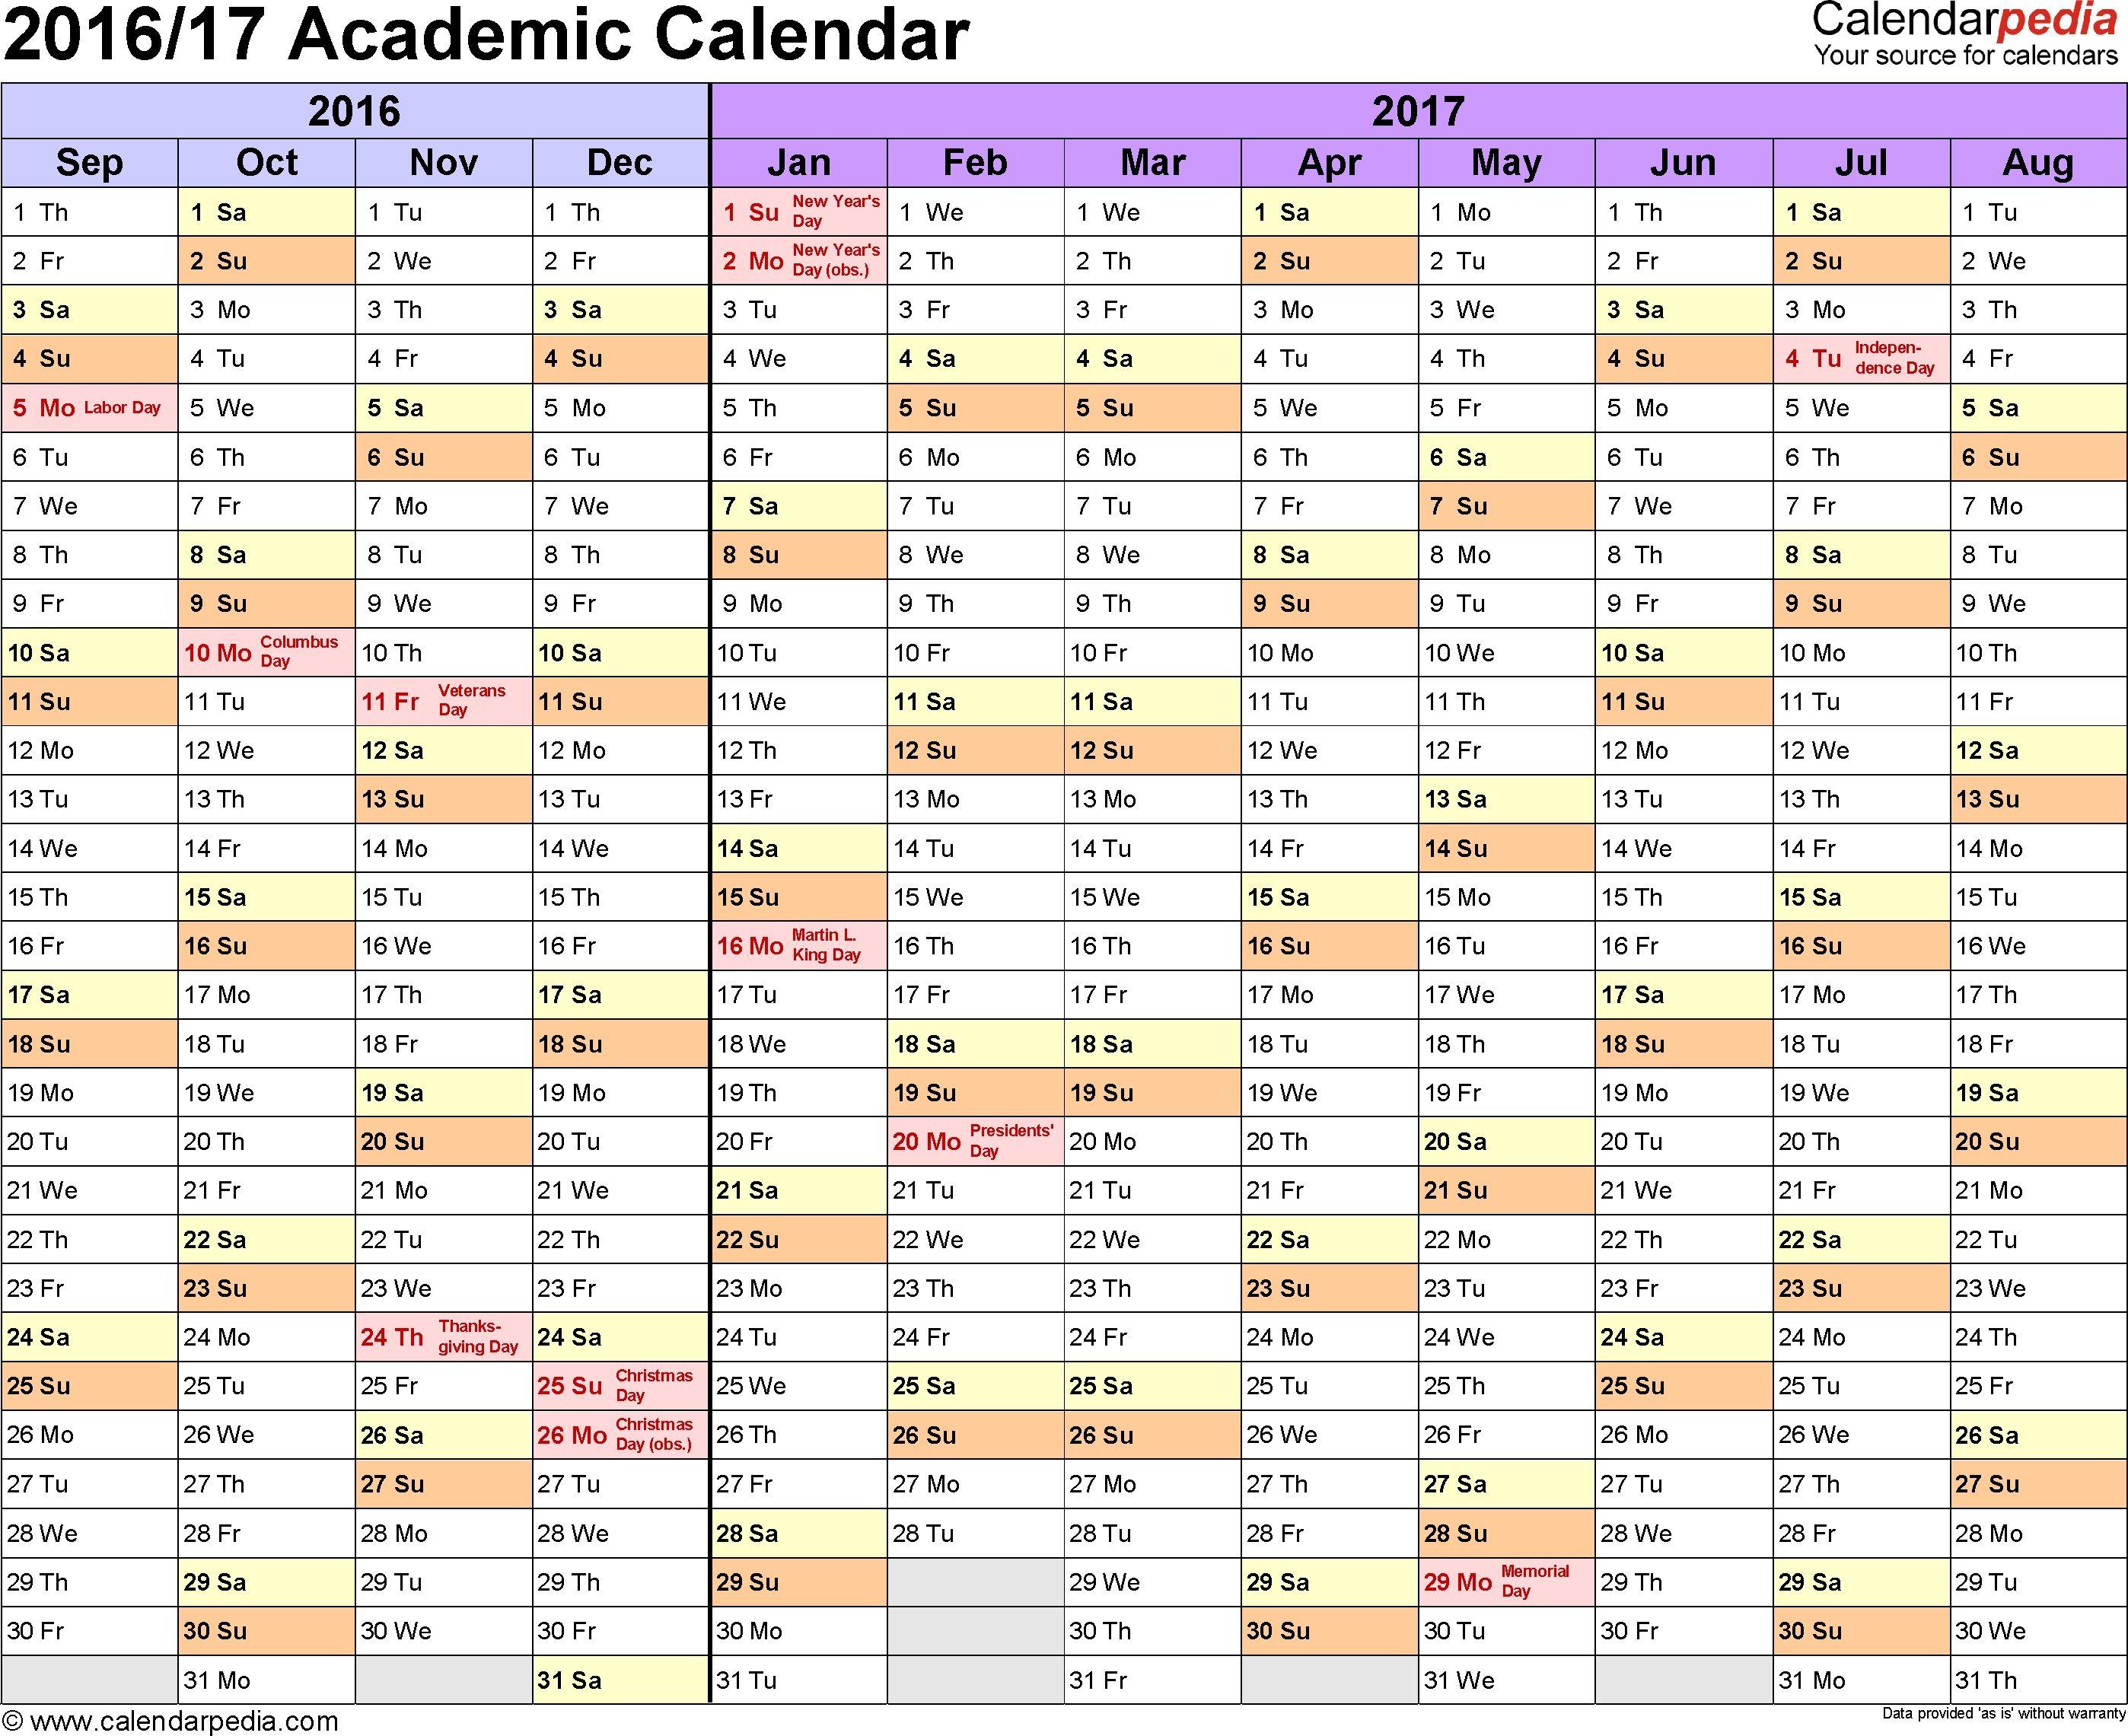 Academic Calendars 2016 2017 Free Printable Word Templates Free Printable Calendar 2016 Academic Calendar Printable Calendar Template